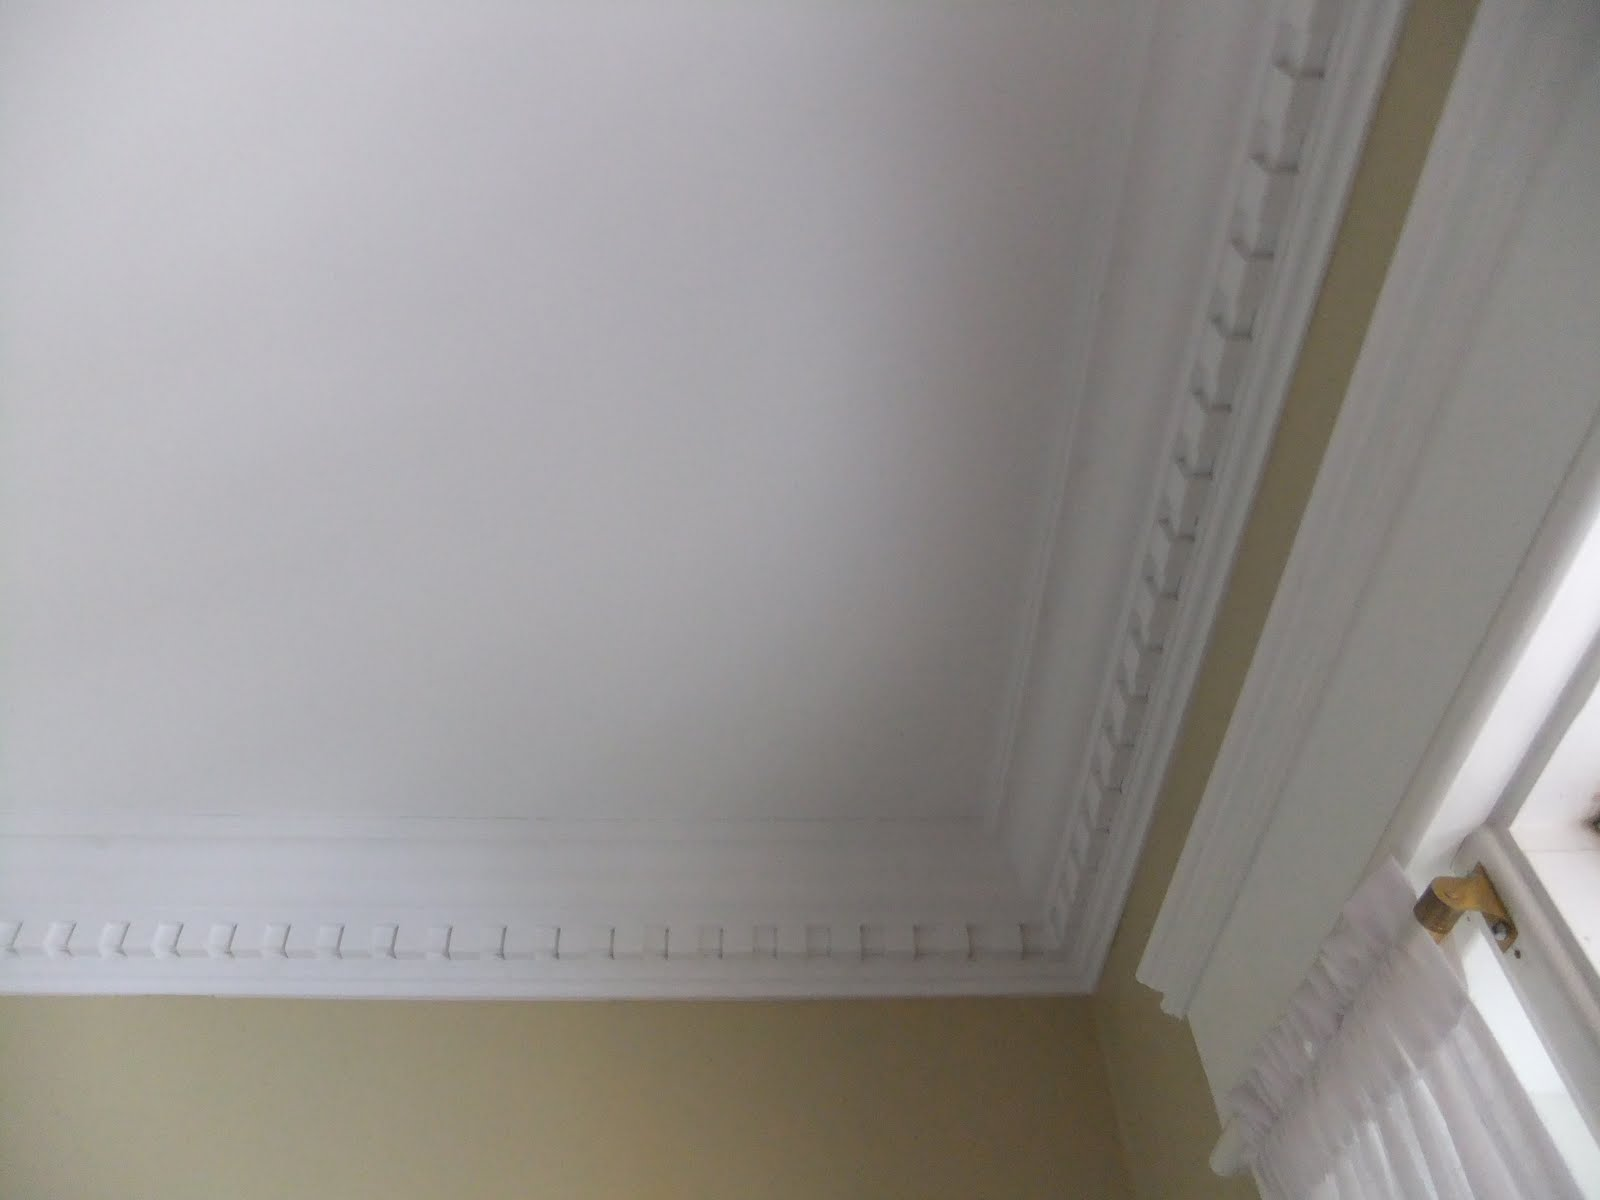 http://1.bp.blogspot.com/_PpKJLX6M__c/TKsSTugN90I/AAAAAAAABGc/MoB_D-tzXUI/s1600/September+25+mirrors+%26+ceiling+047.JPG